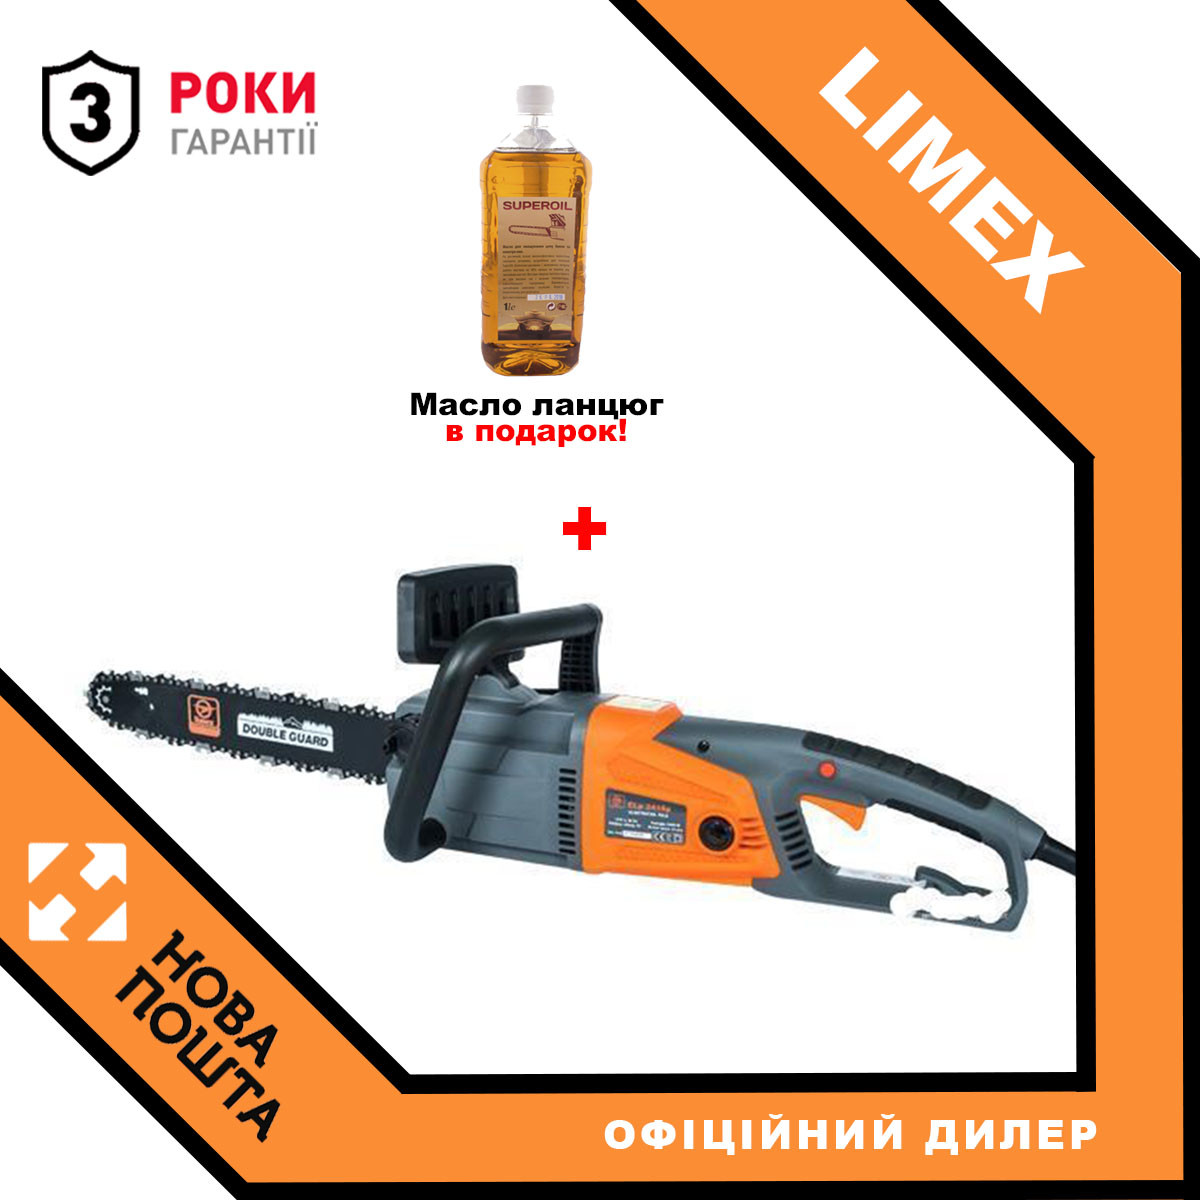 Пила ланцюгова електрична Limex ELp 2416p + В подарунок масло ланцюг!